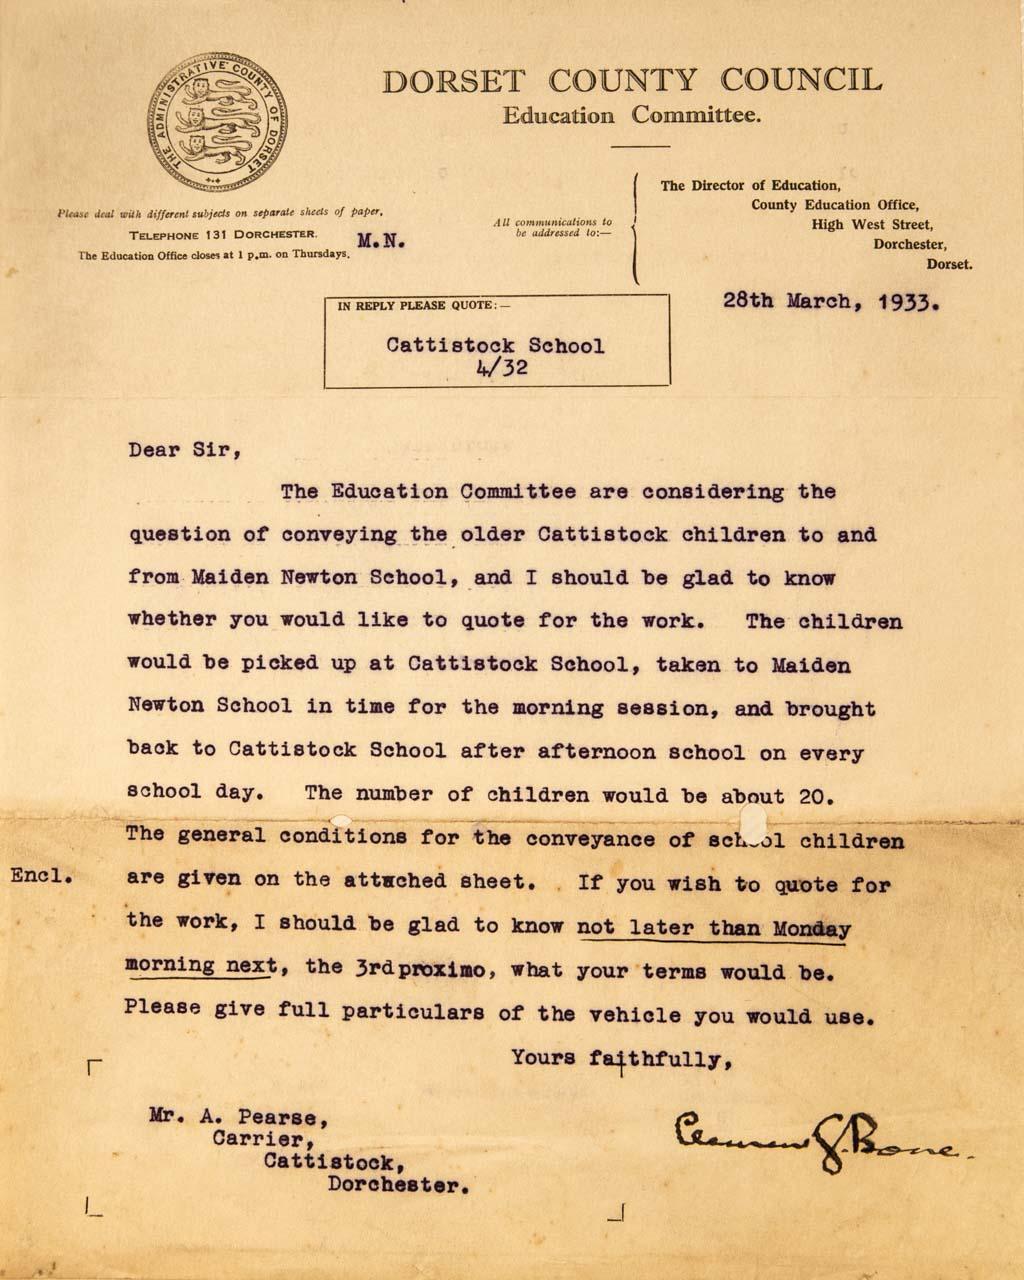 The invitation to quote for the Cattistock to Maiden Newton School contract